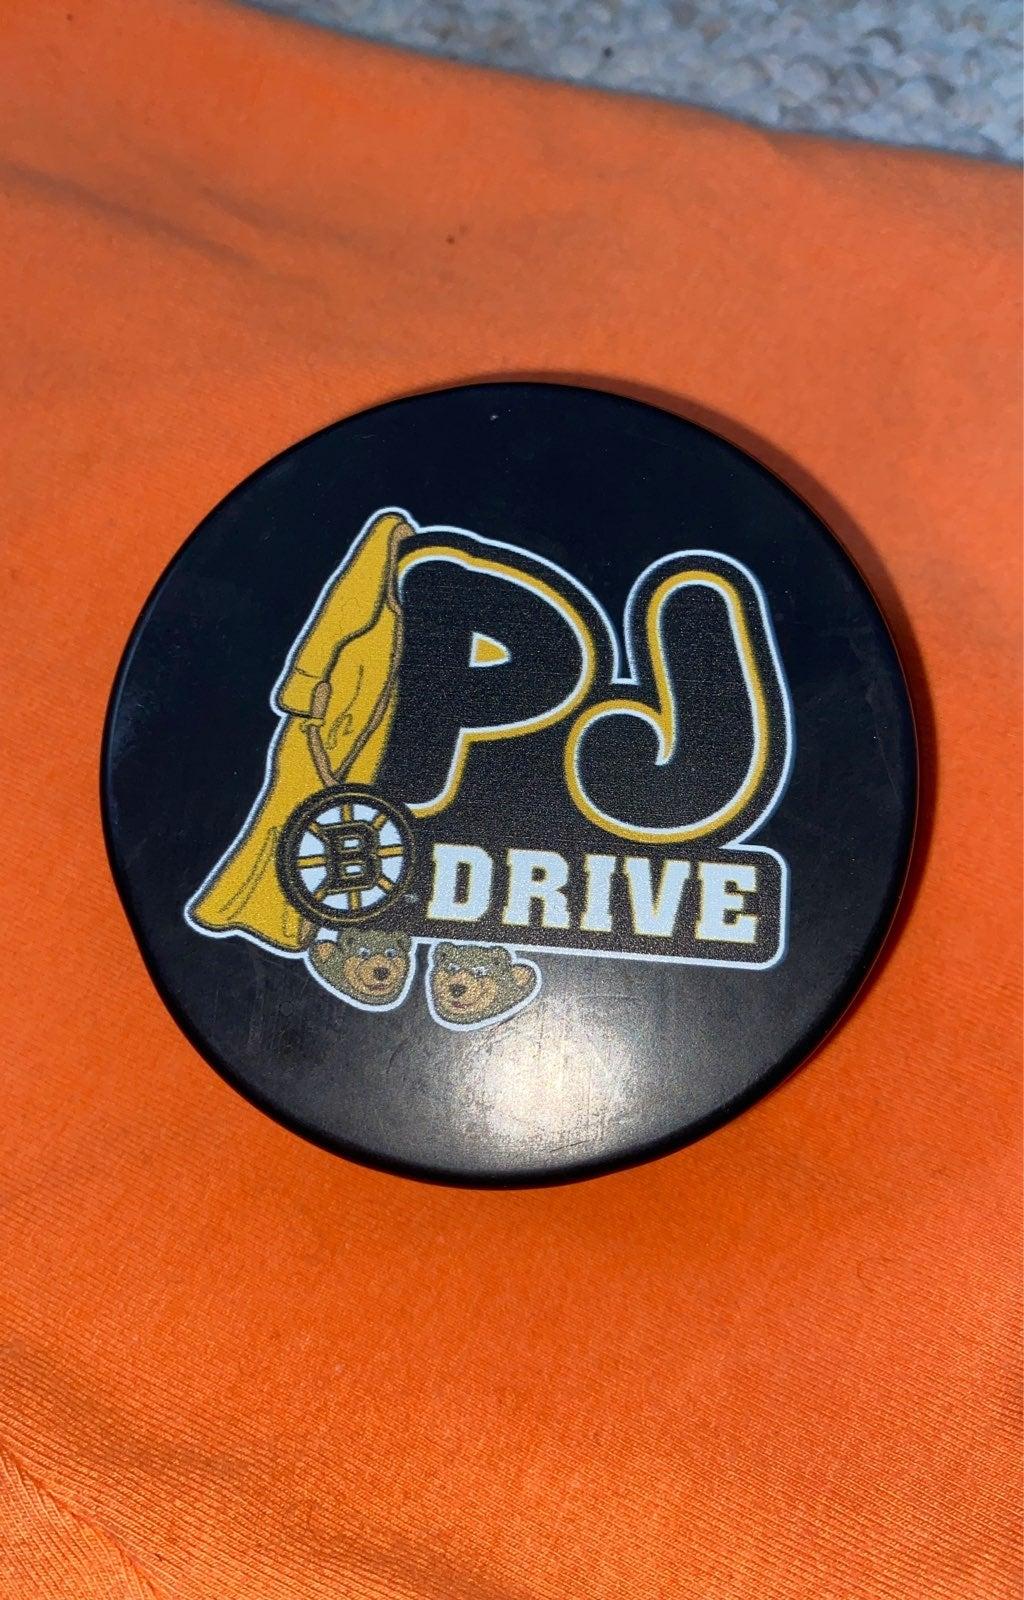 PJ drive Bruins Hockey puck